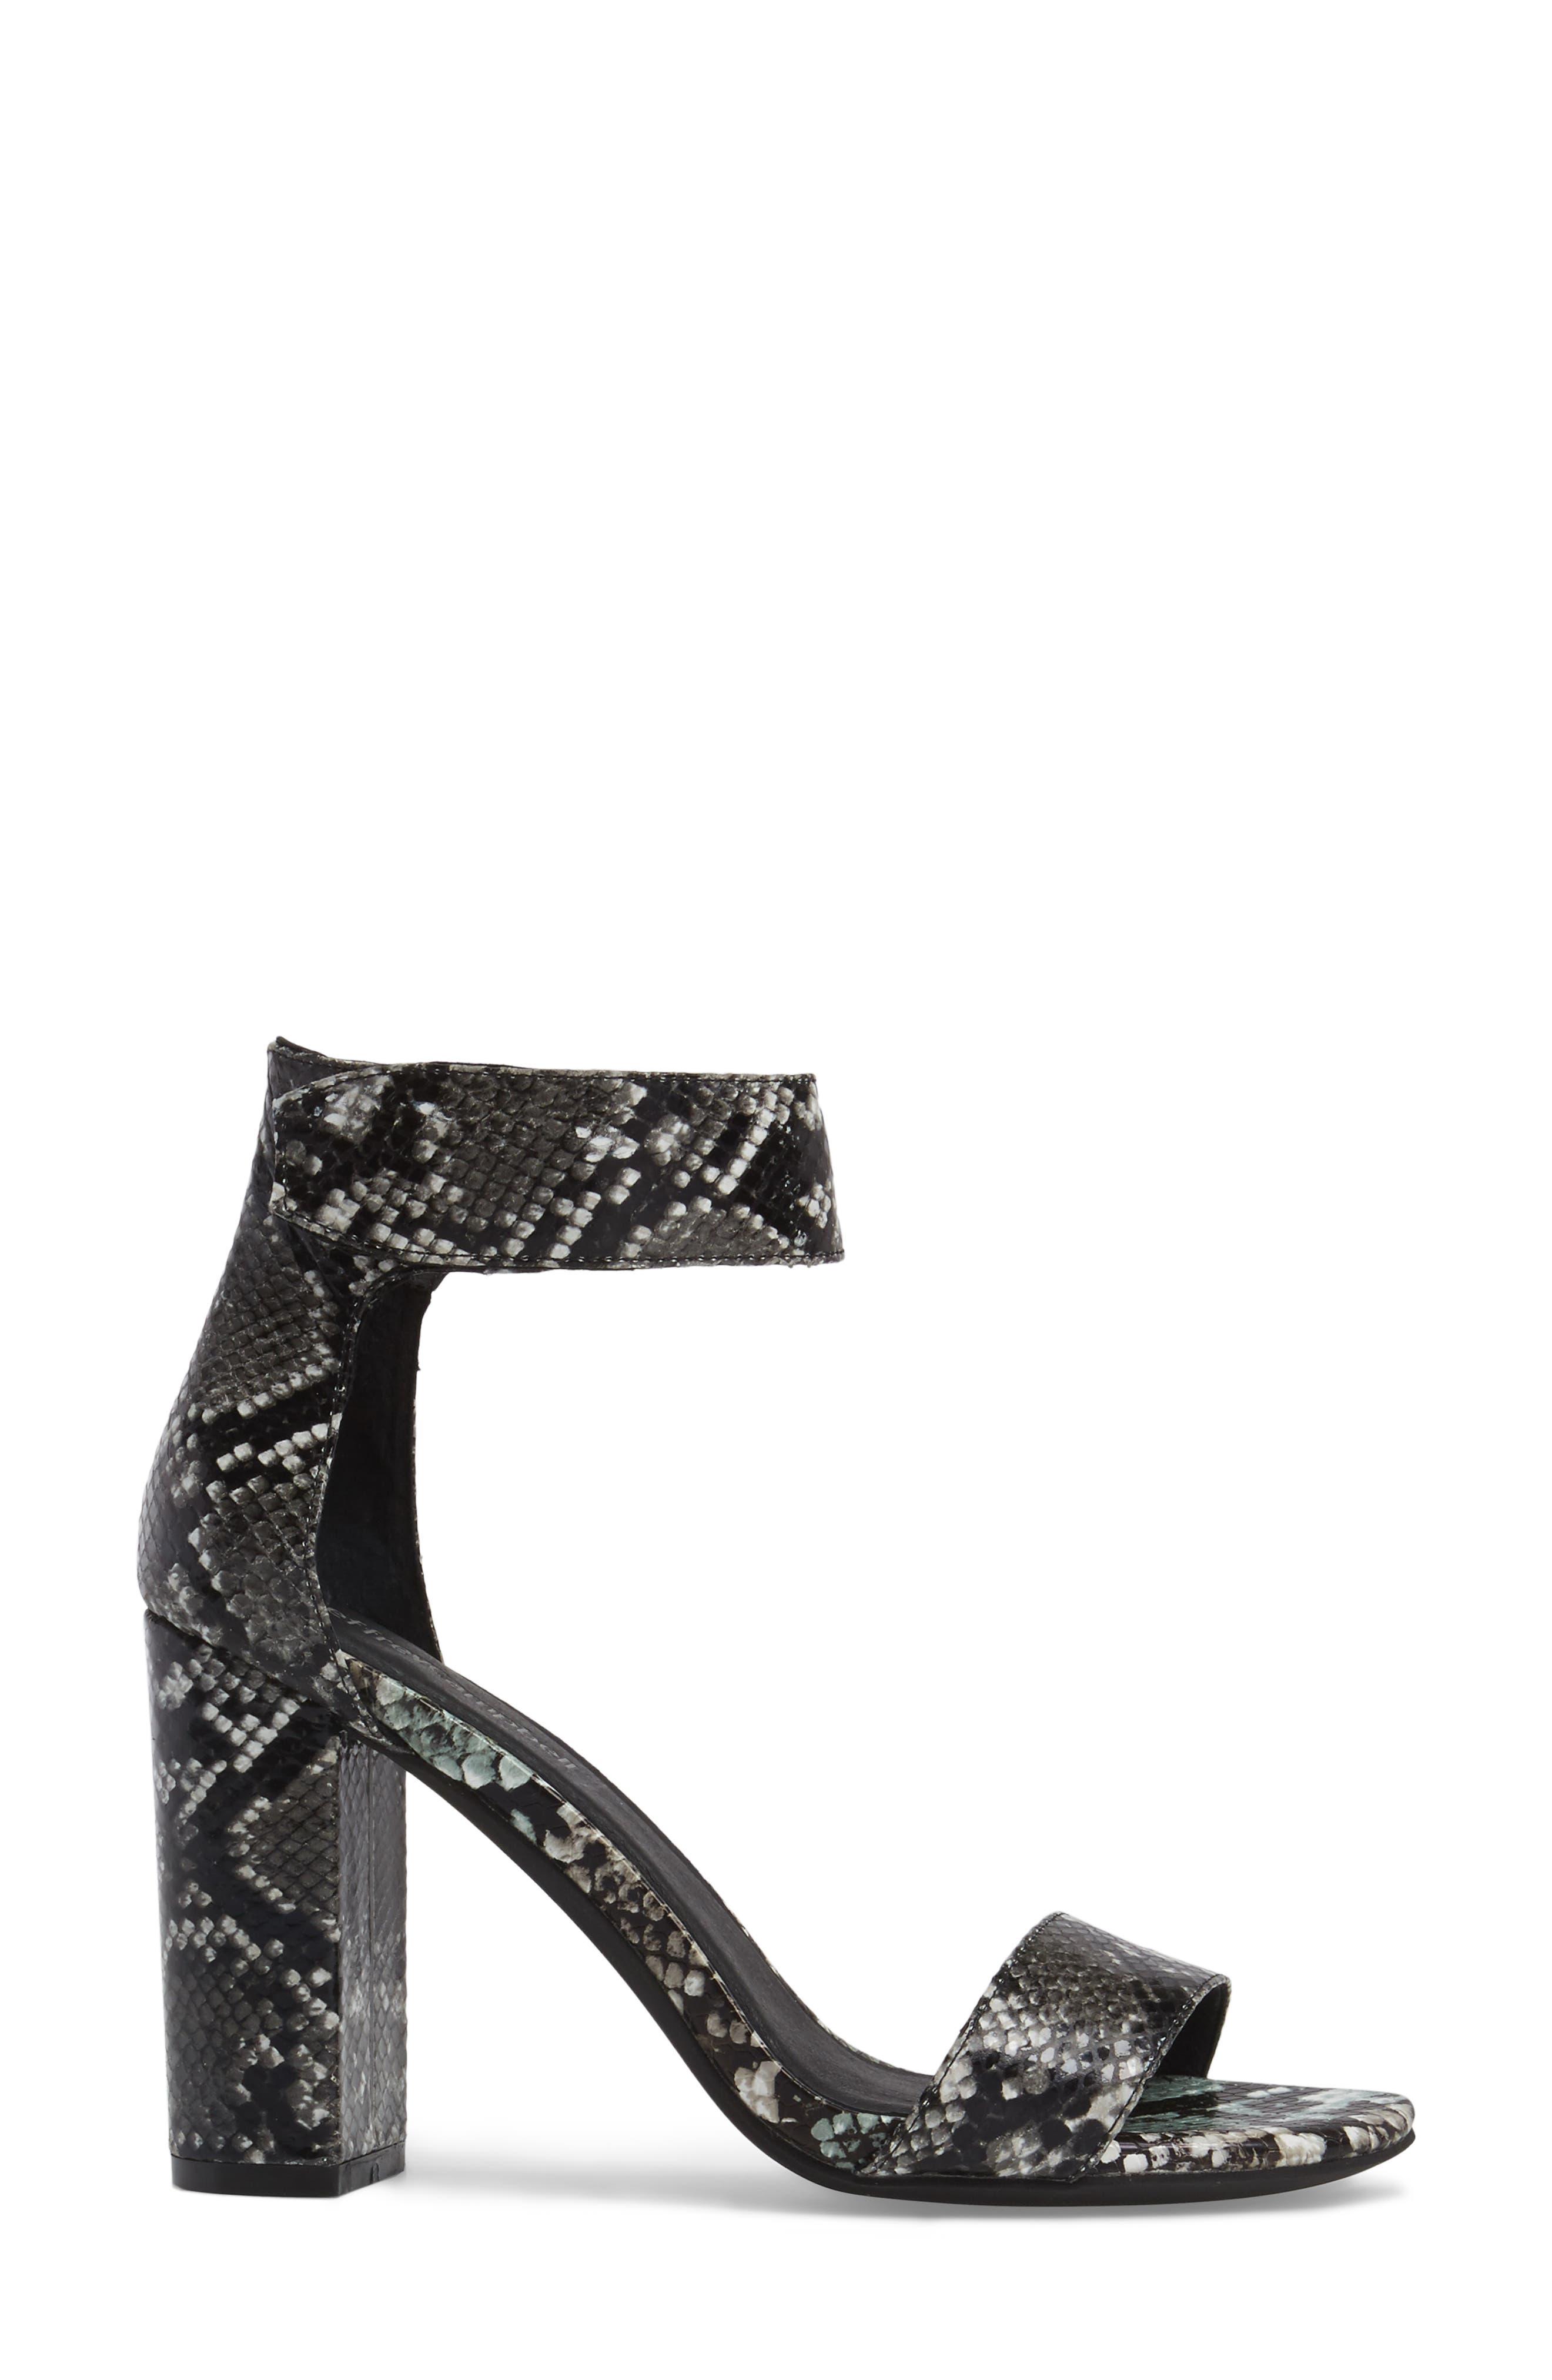 'Lindsay' Ankle Strap Sandal,                             Alternate thumbnail 3, color,                             Black Grey Snake